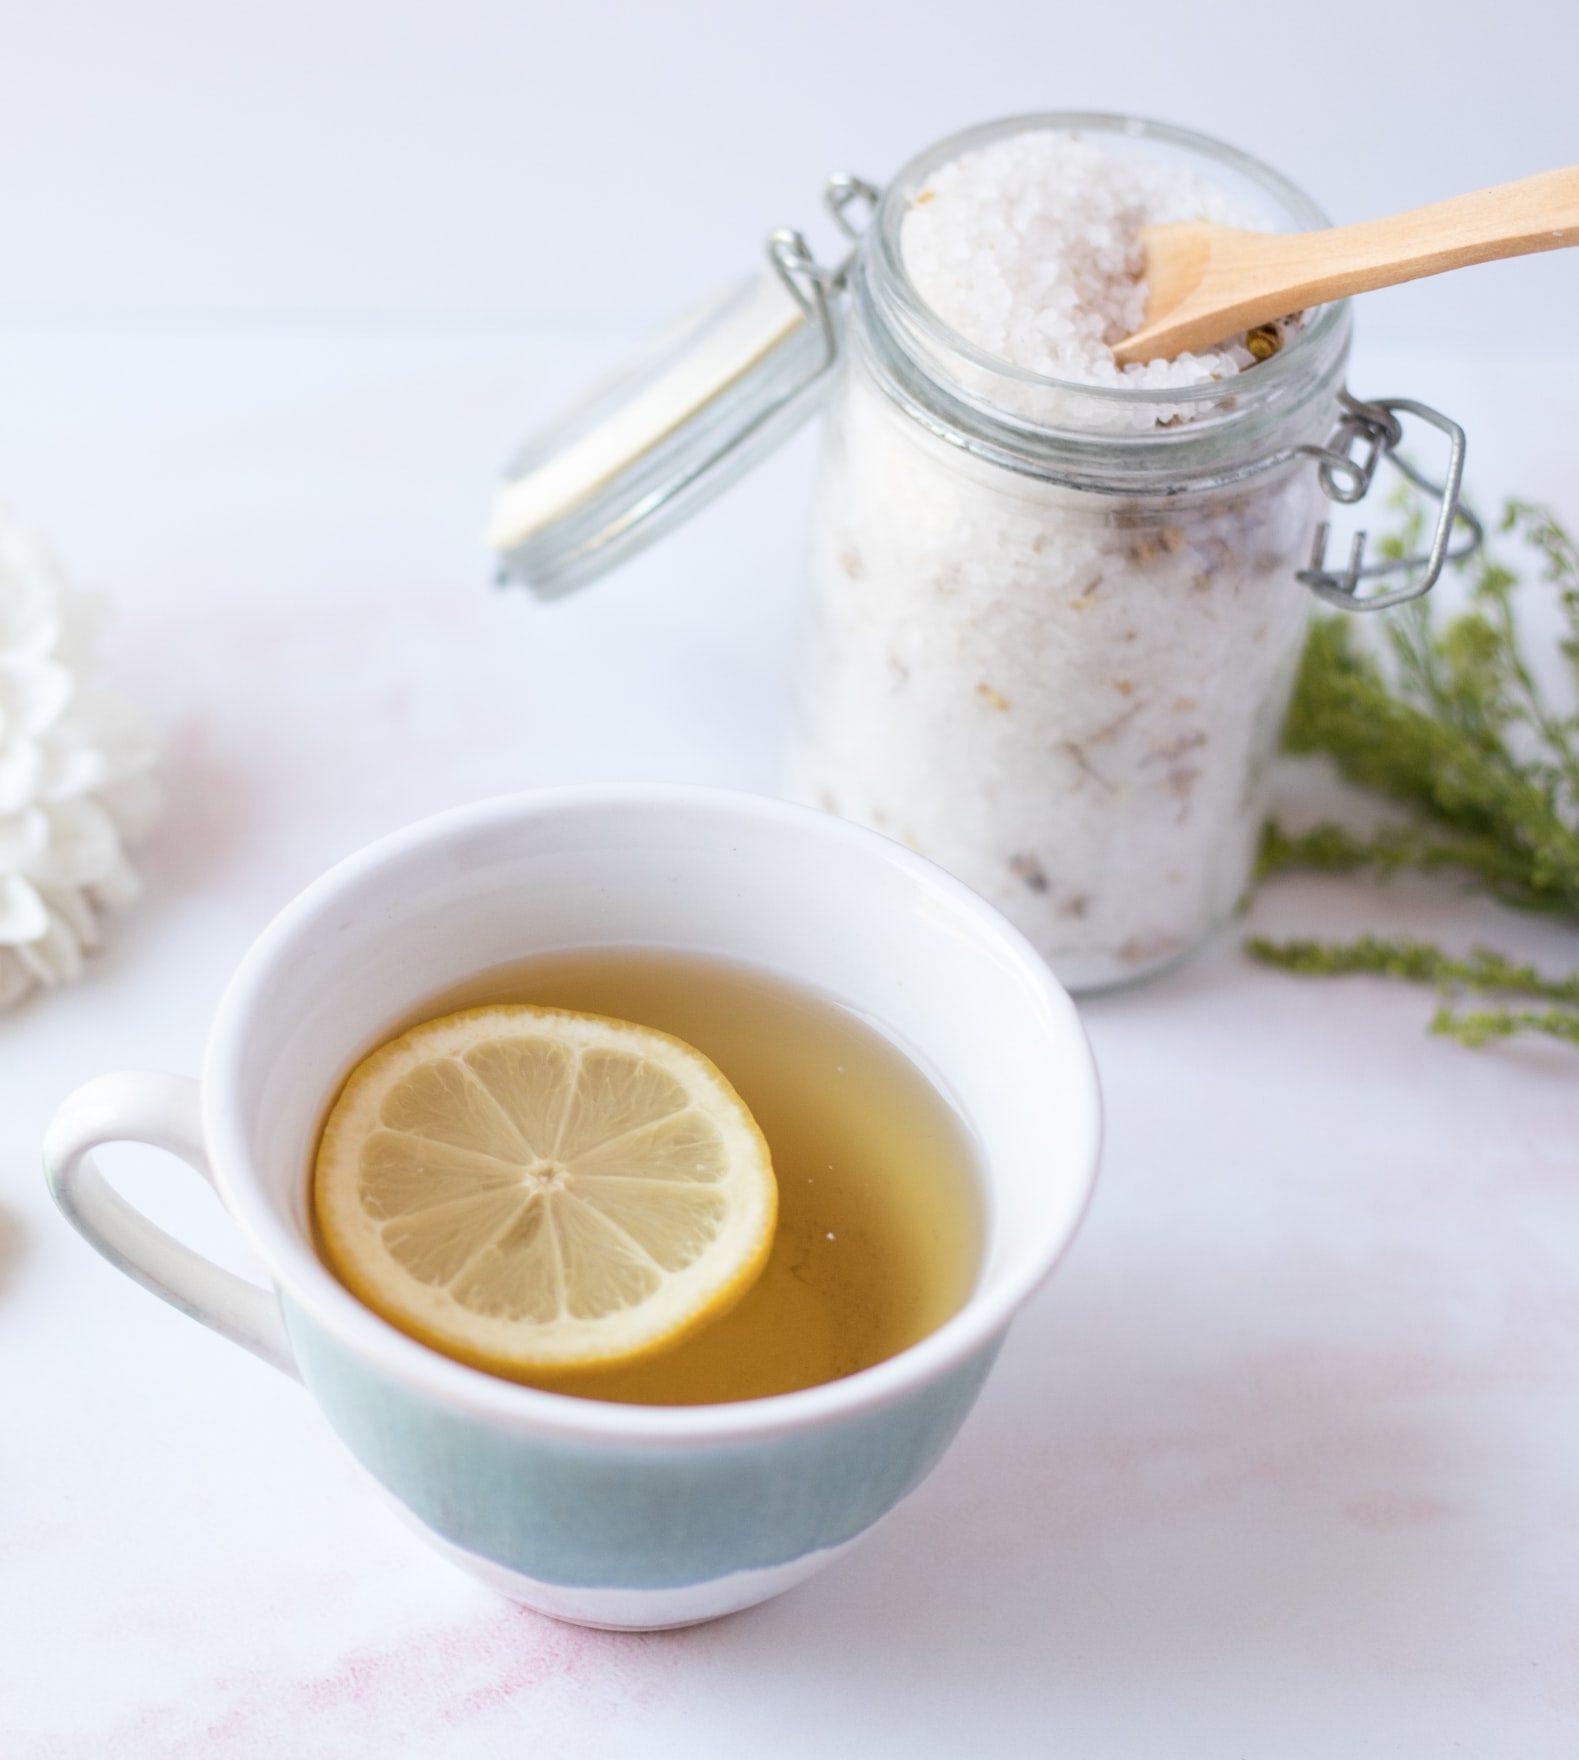 DIY BEAUTY TREATMENTS USING TEA